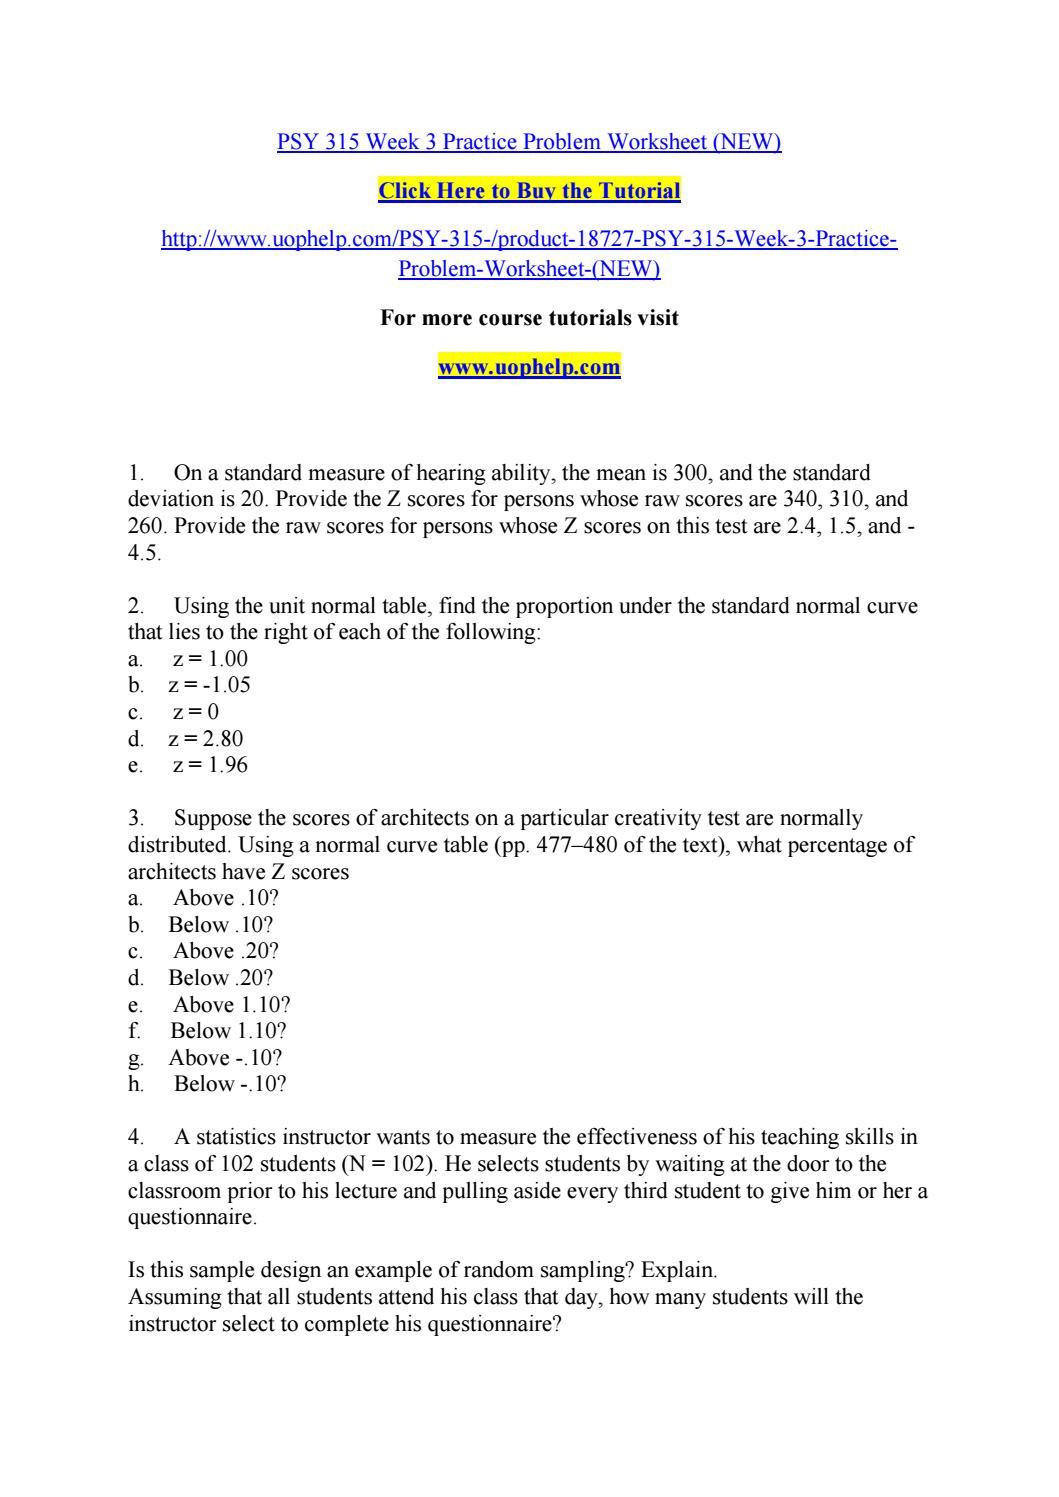 Z Score Practice Worksheet Psy 315 Week 3 Practice Problem Worksheet New by Cvfr issuu